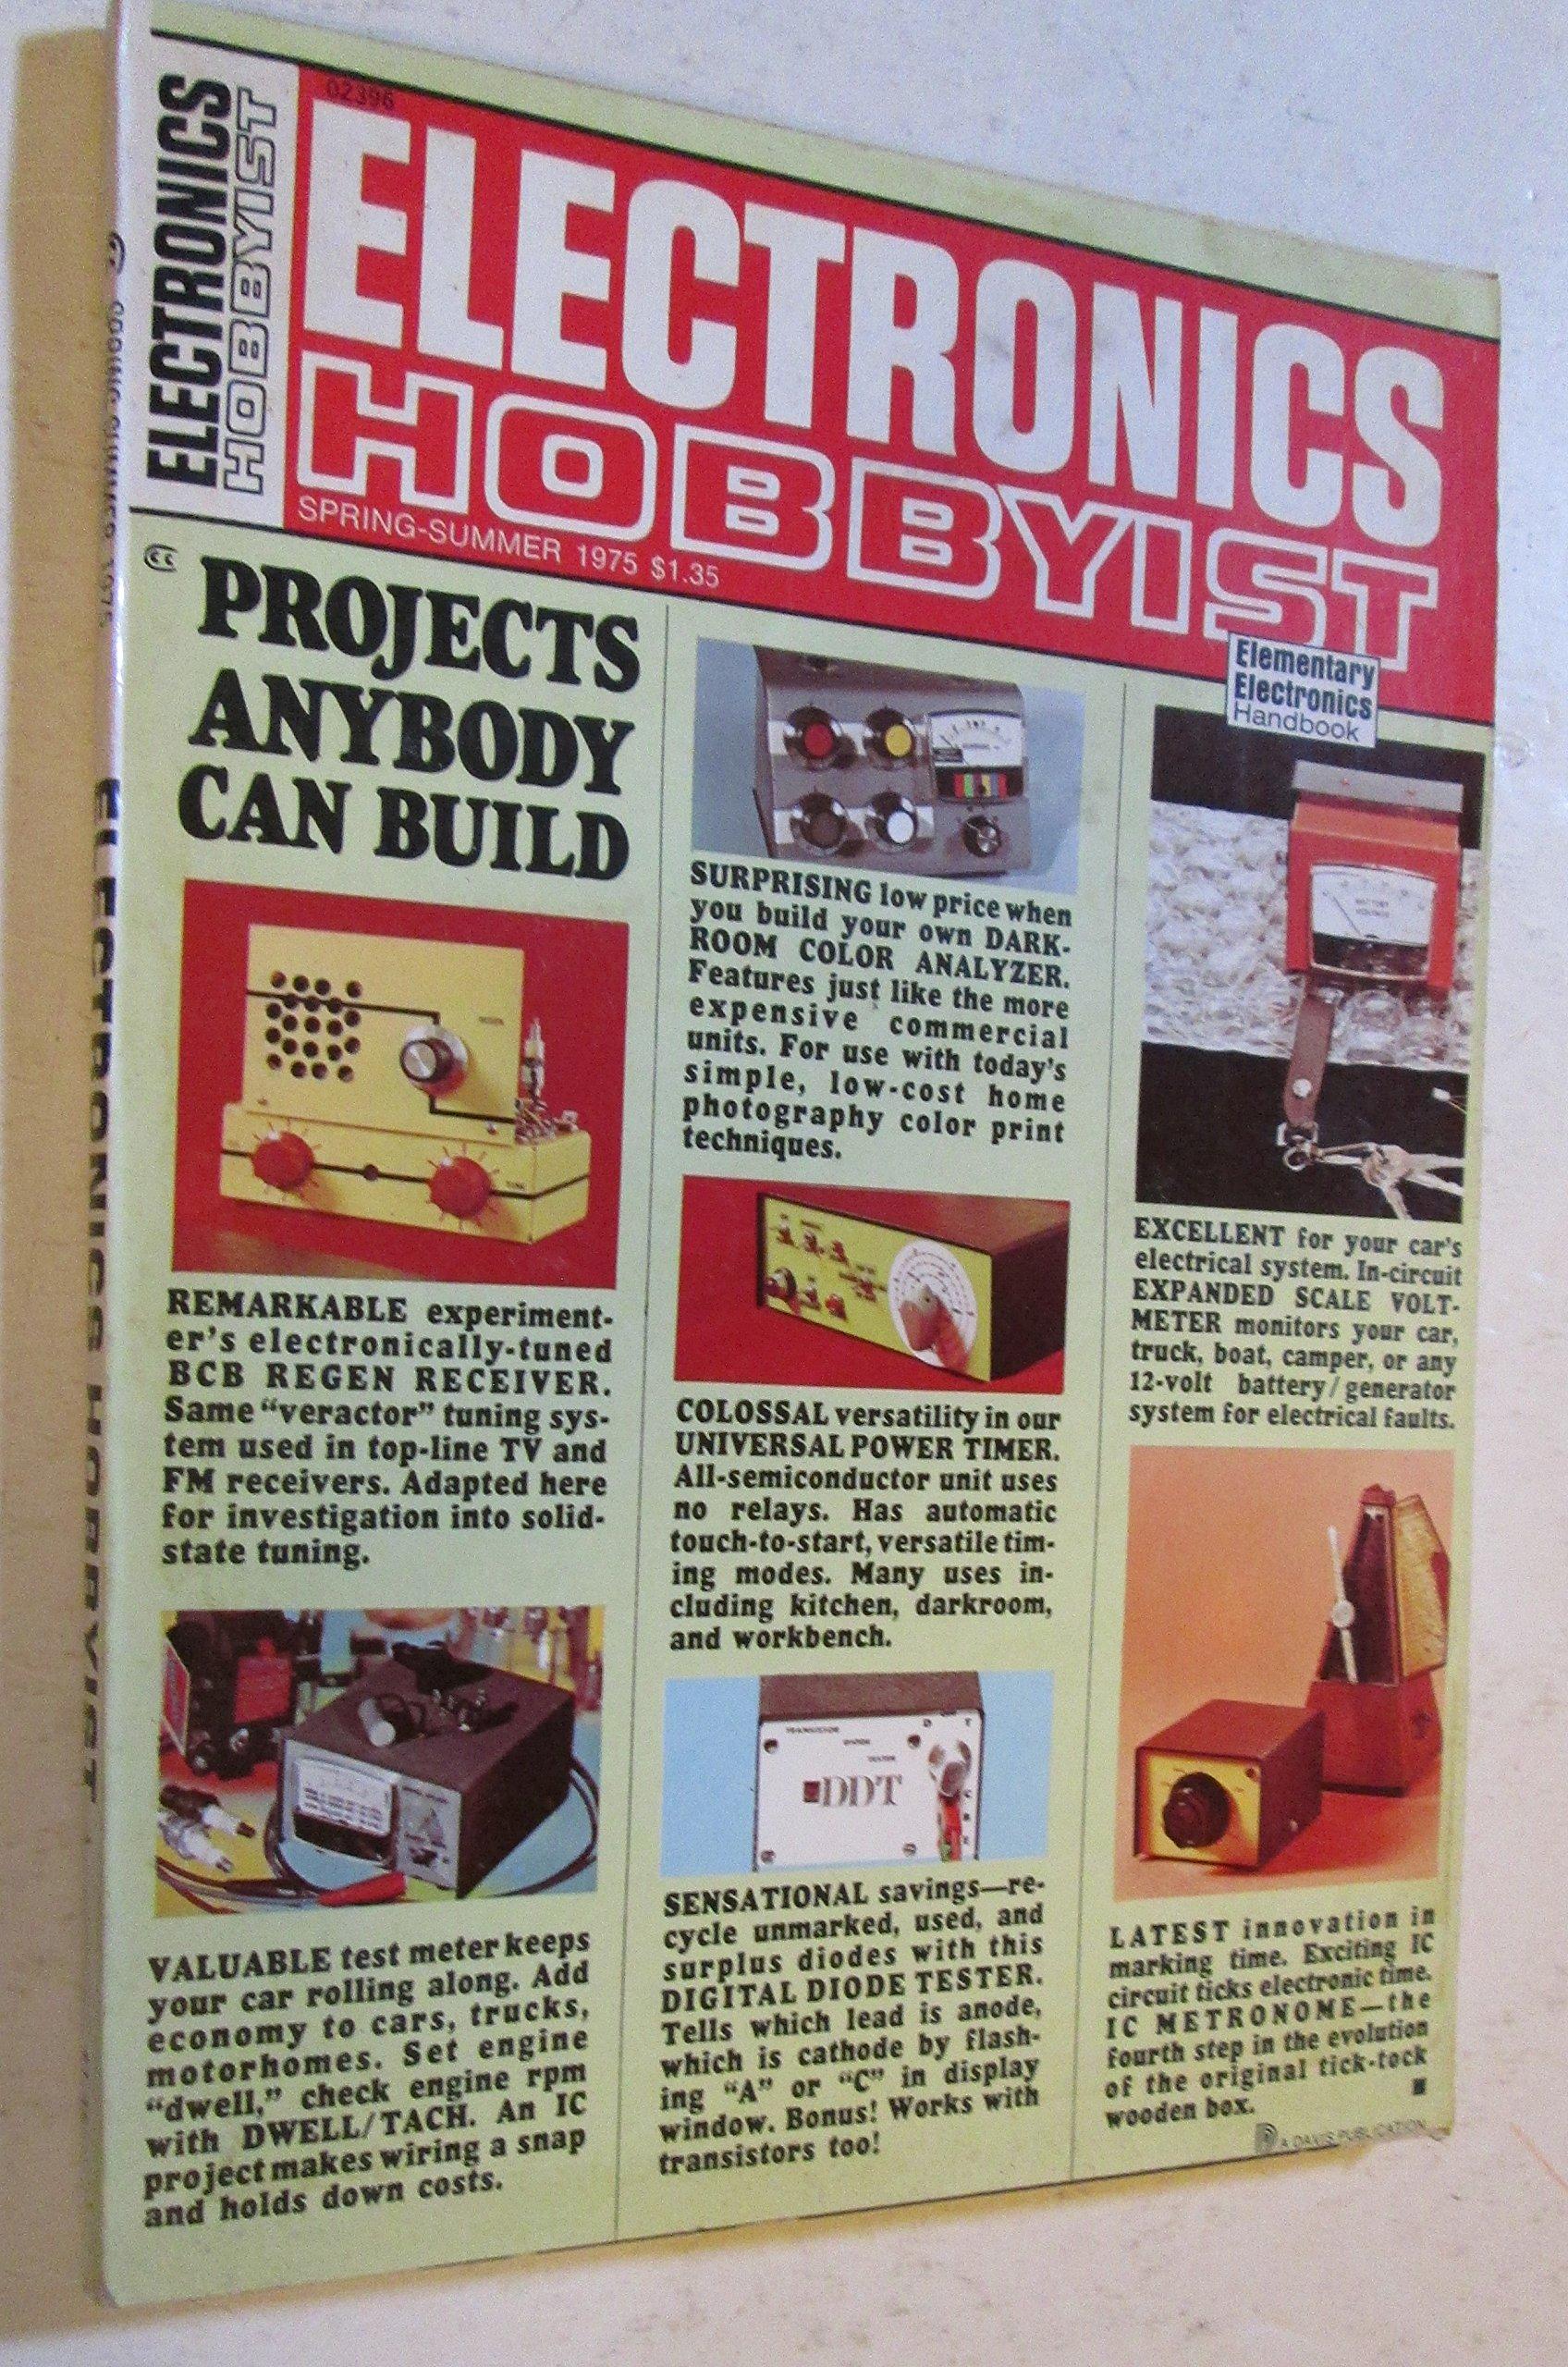 Electronics Hobbyist Magazine Spring Summer 1975 Davis Publications Beginning Circuitry Build A Metronome Inc 0737029964005 Books